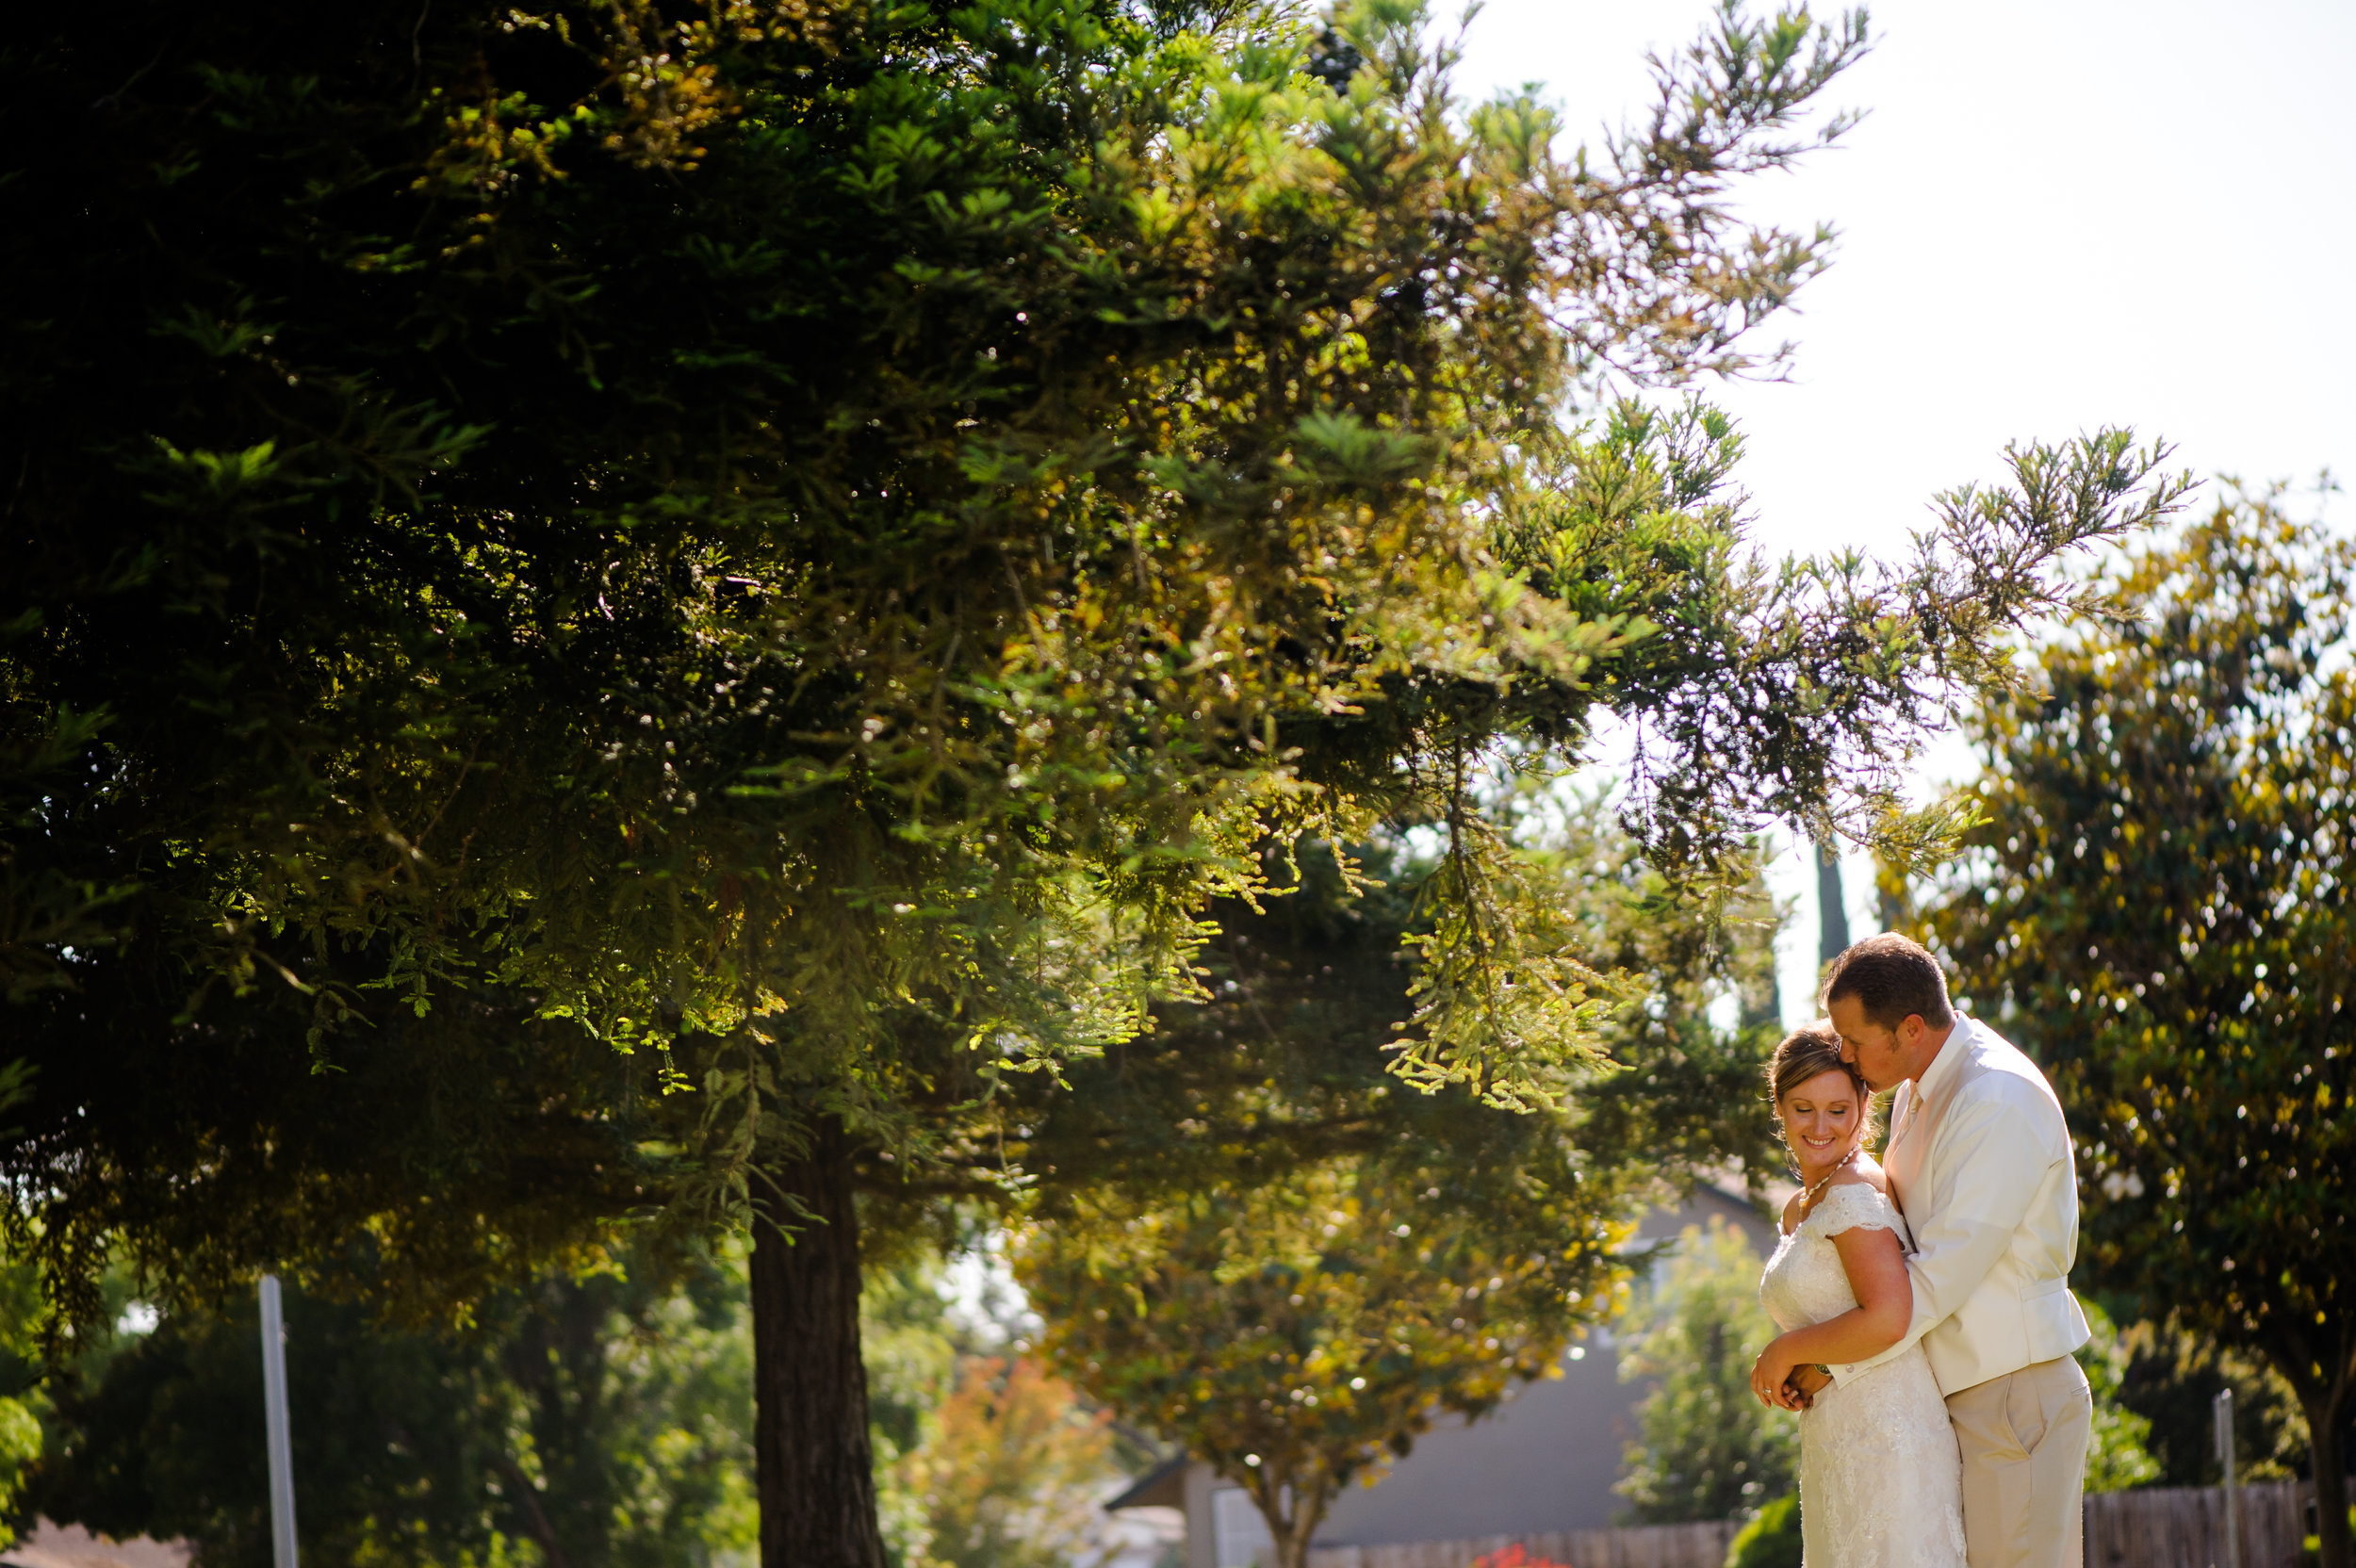 danielle-ross-025-sacramento-wedding-photographer-katherine-nicole-photography.JPG